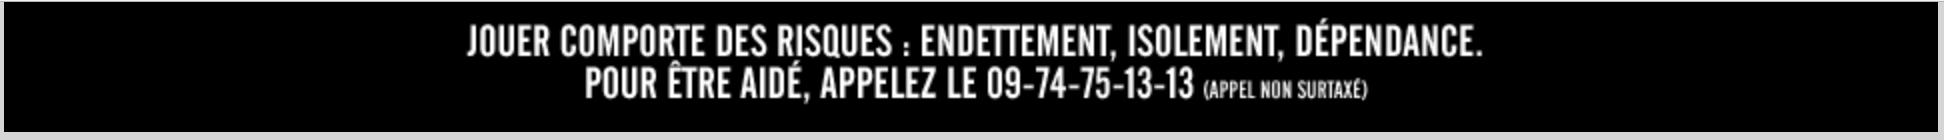 Screen Shot 2017 08 17 at 15.08.01 - Qui Sommes Nous